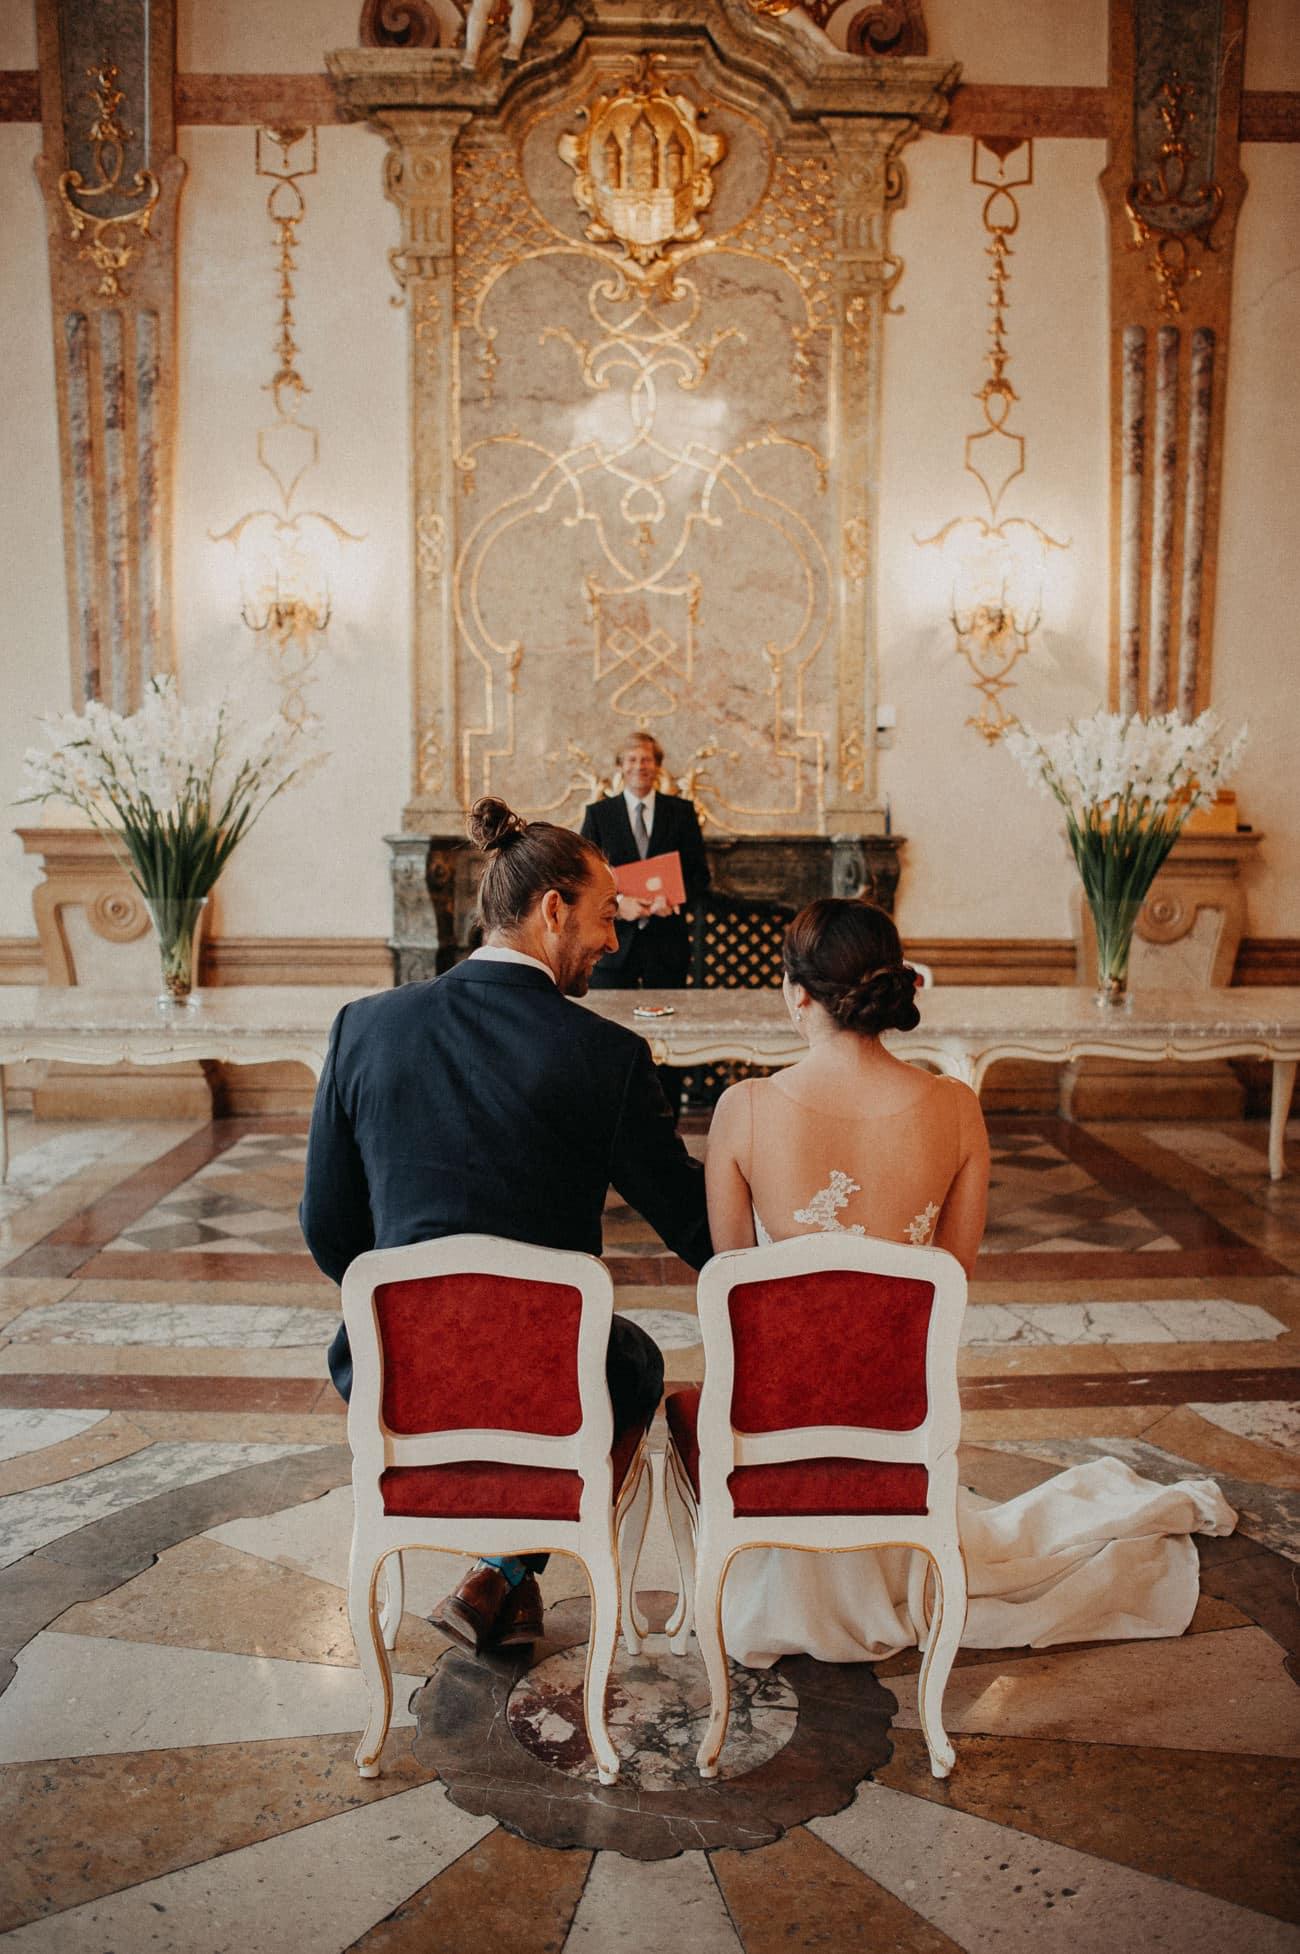 wedding photographer salzburg palace mirabell 046 - Hochzeitsfotograf Schloss Mirabell Salzburg